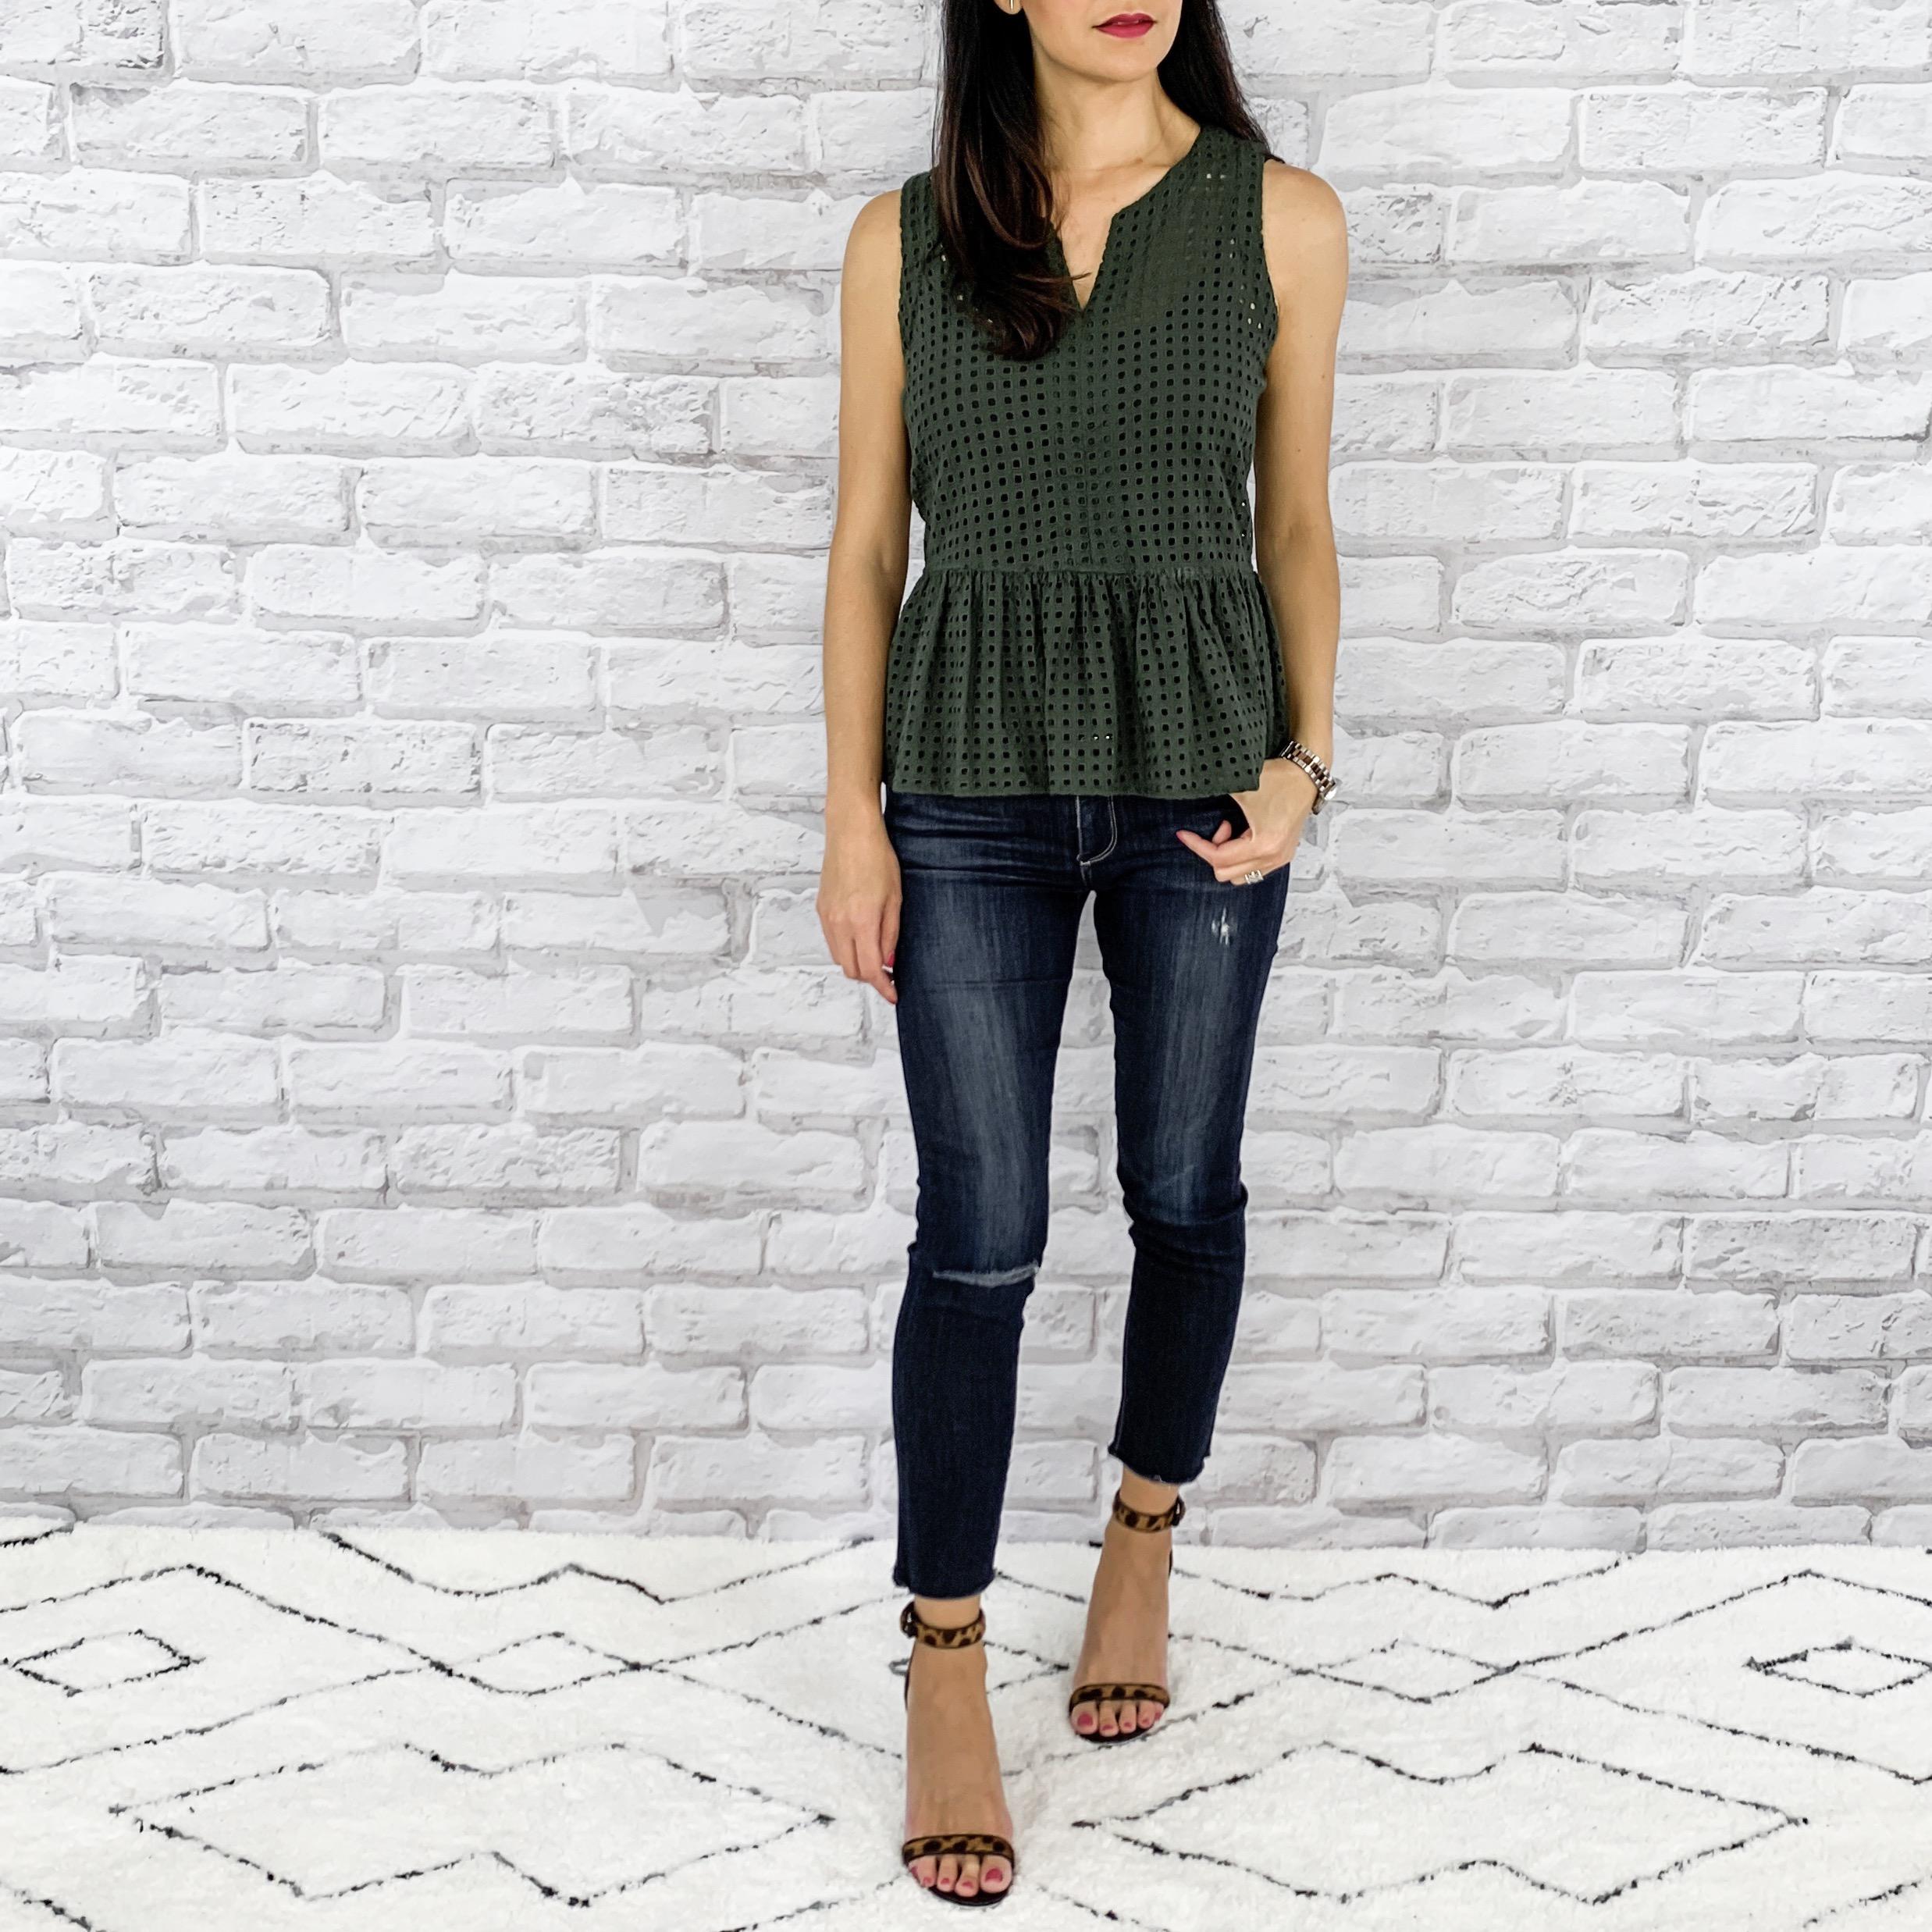 — OUTFIT DETAILS —  Halogen Top | Paige Denim Jeans | Givenchy Shoes   — CCW DETAILS —    StealthGearUSA Holster     | Sig Sauer P365 |   SureFire Stiletto Flashlight     |   Belt